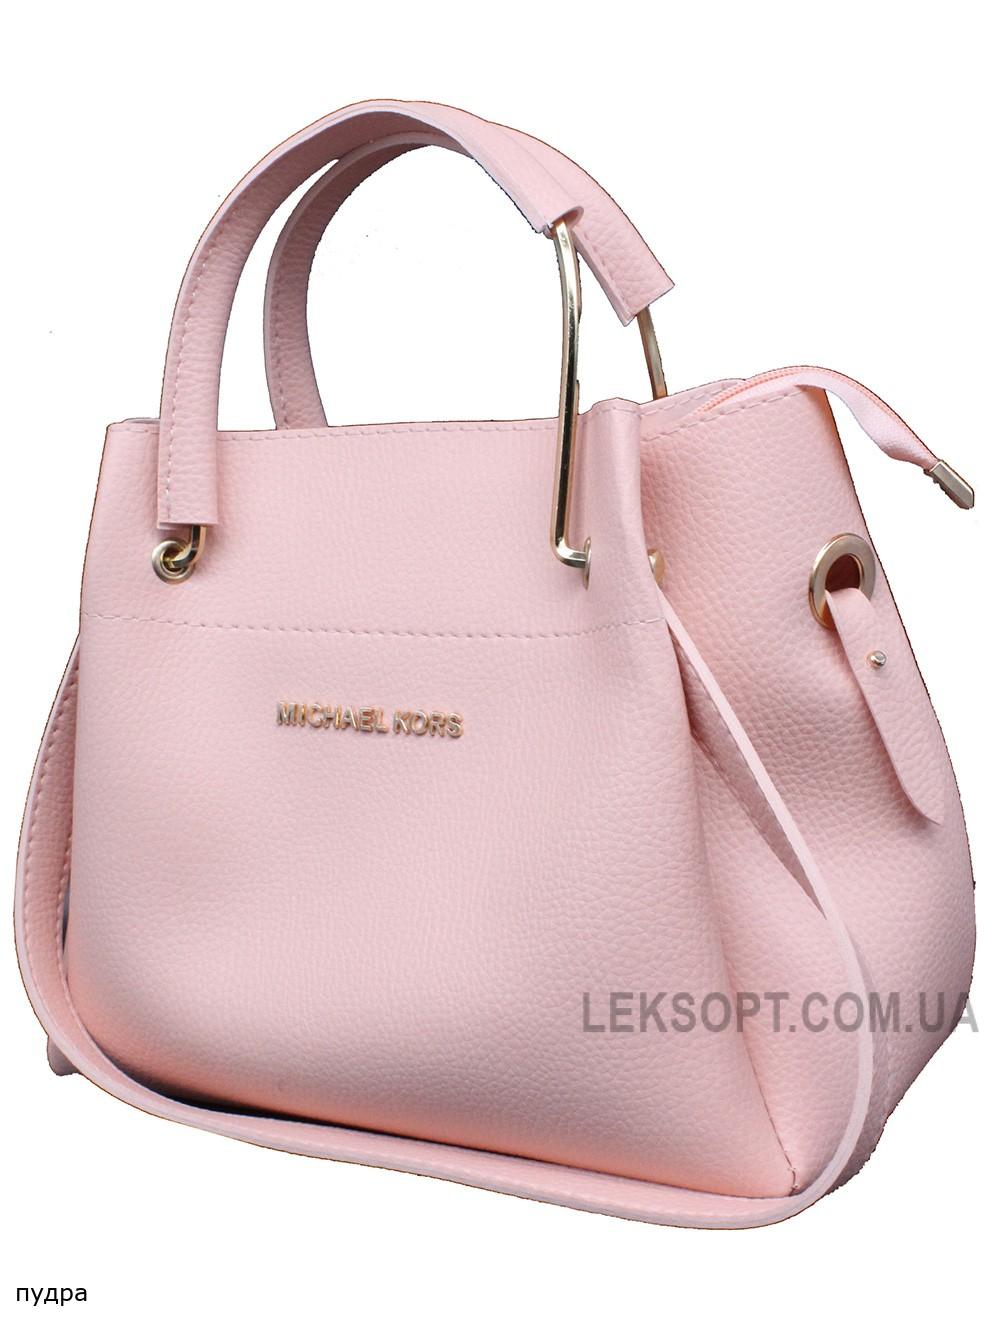 Женская модельная сумка Michael Kors кожзам 28х22х13 - Mi102-104